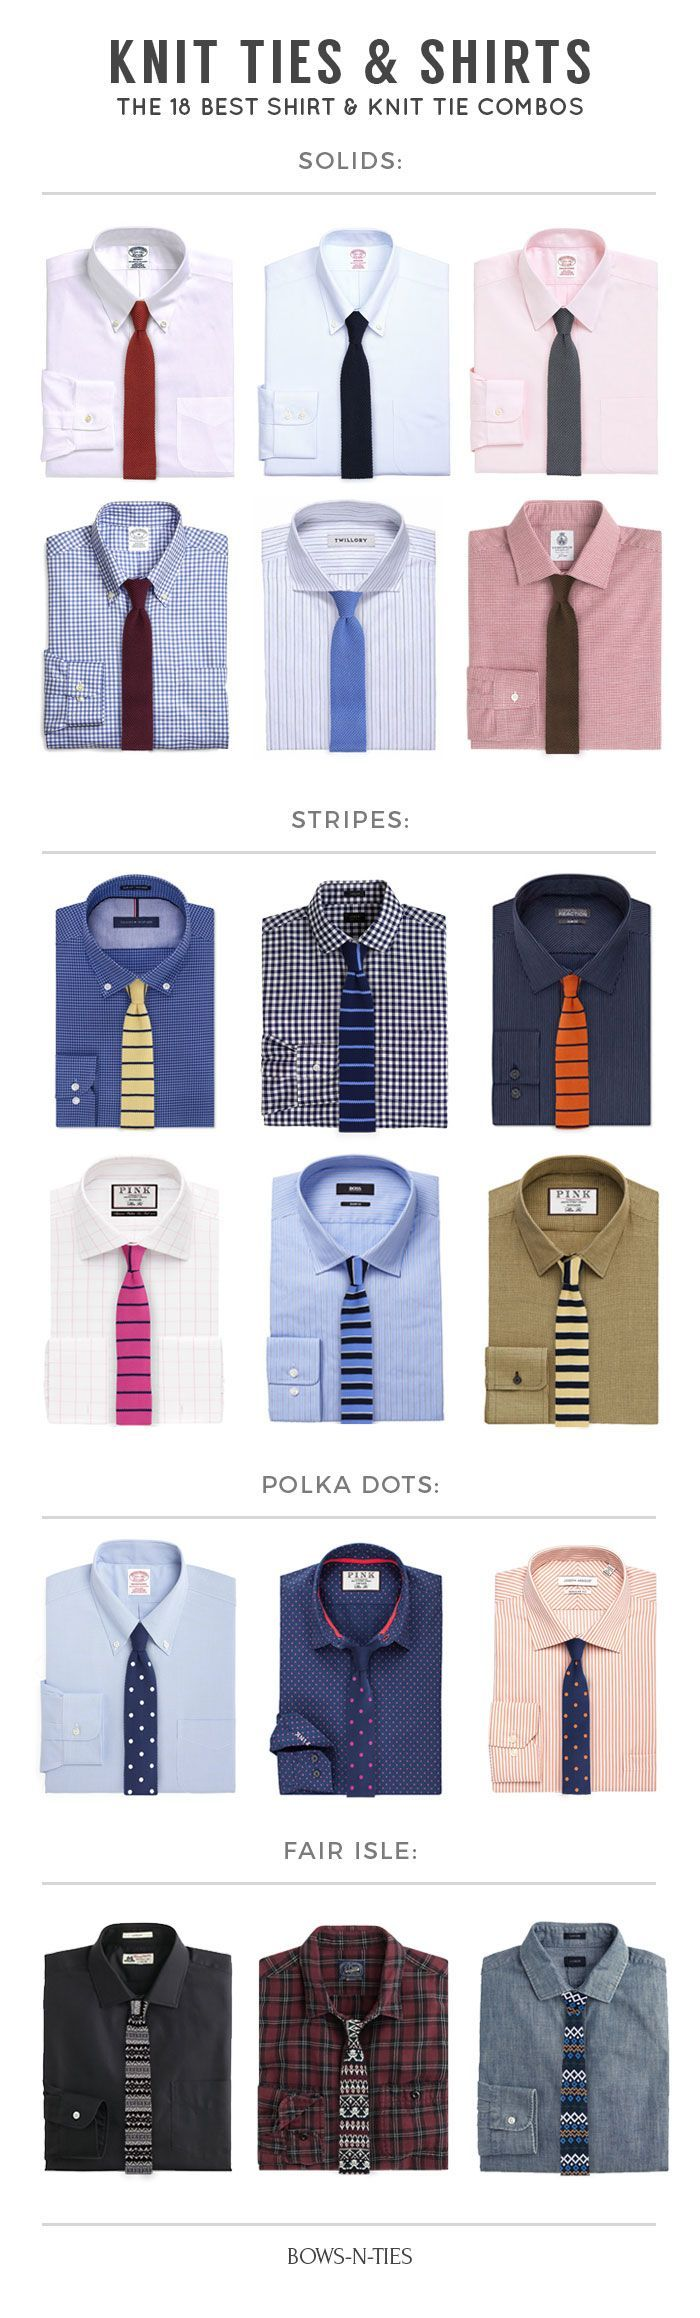 Innovative Shirt + Knit Tie Pairings